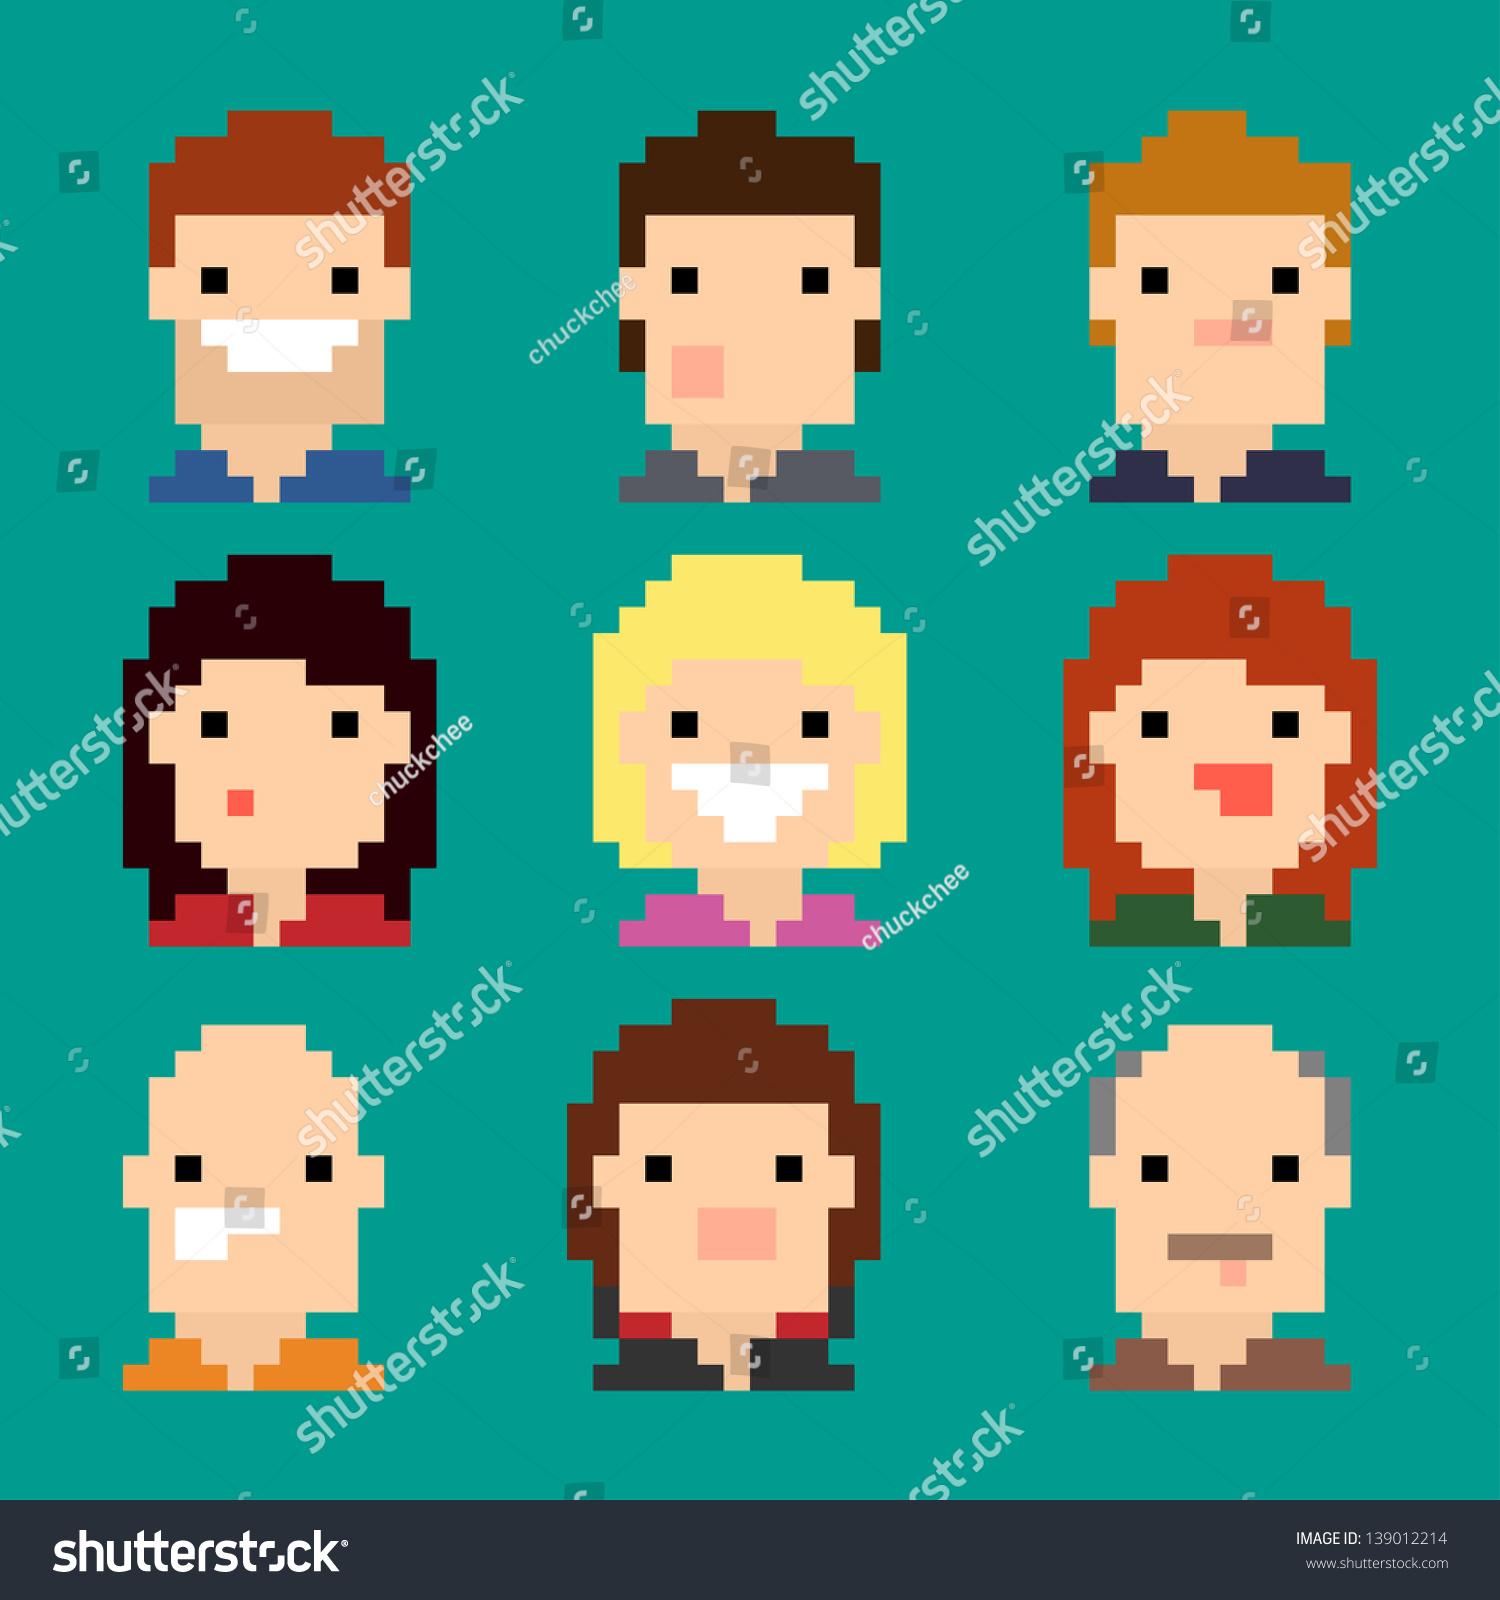 Pixel Faces Stock Vector Illustration 139012214 : Shutterstock